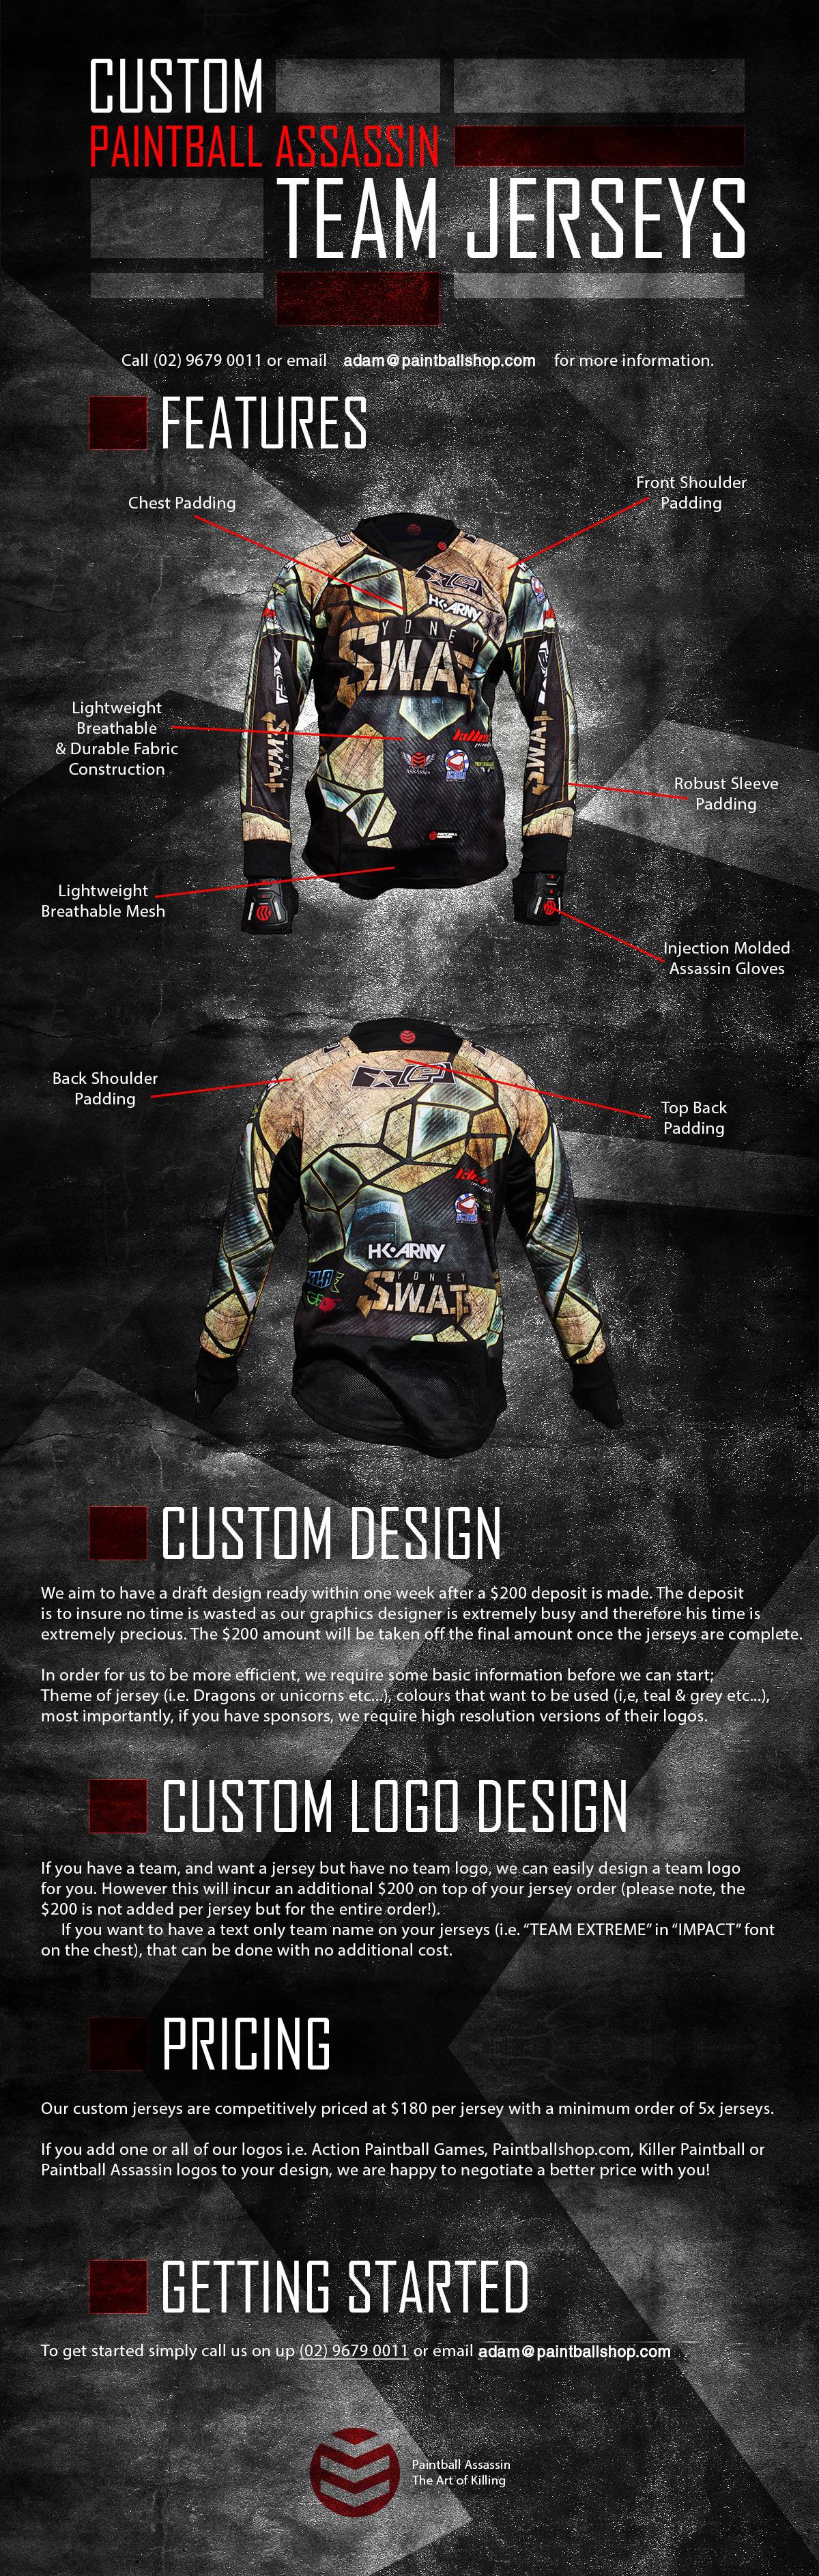 pba-custom.jpg